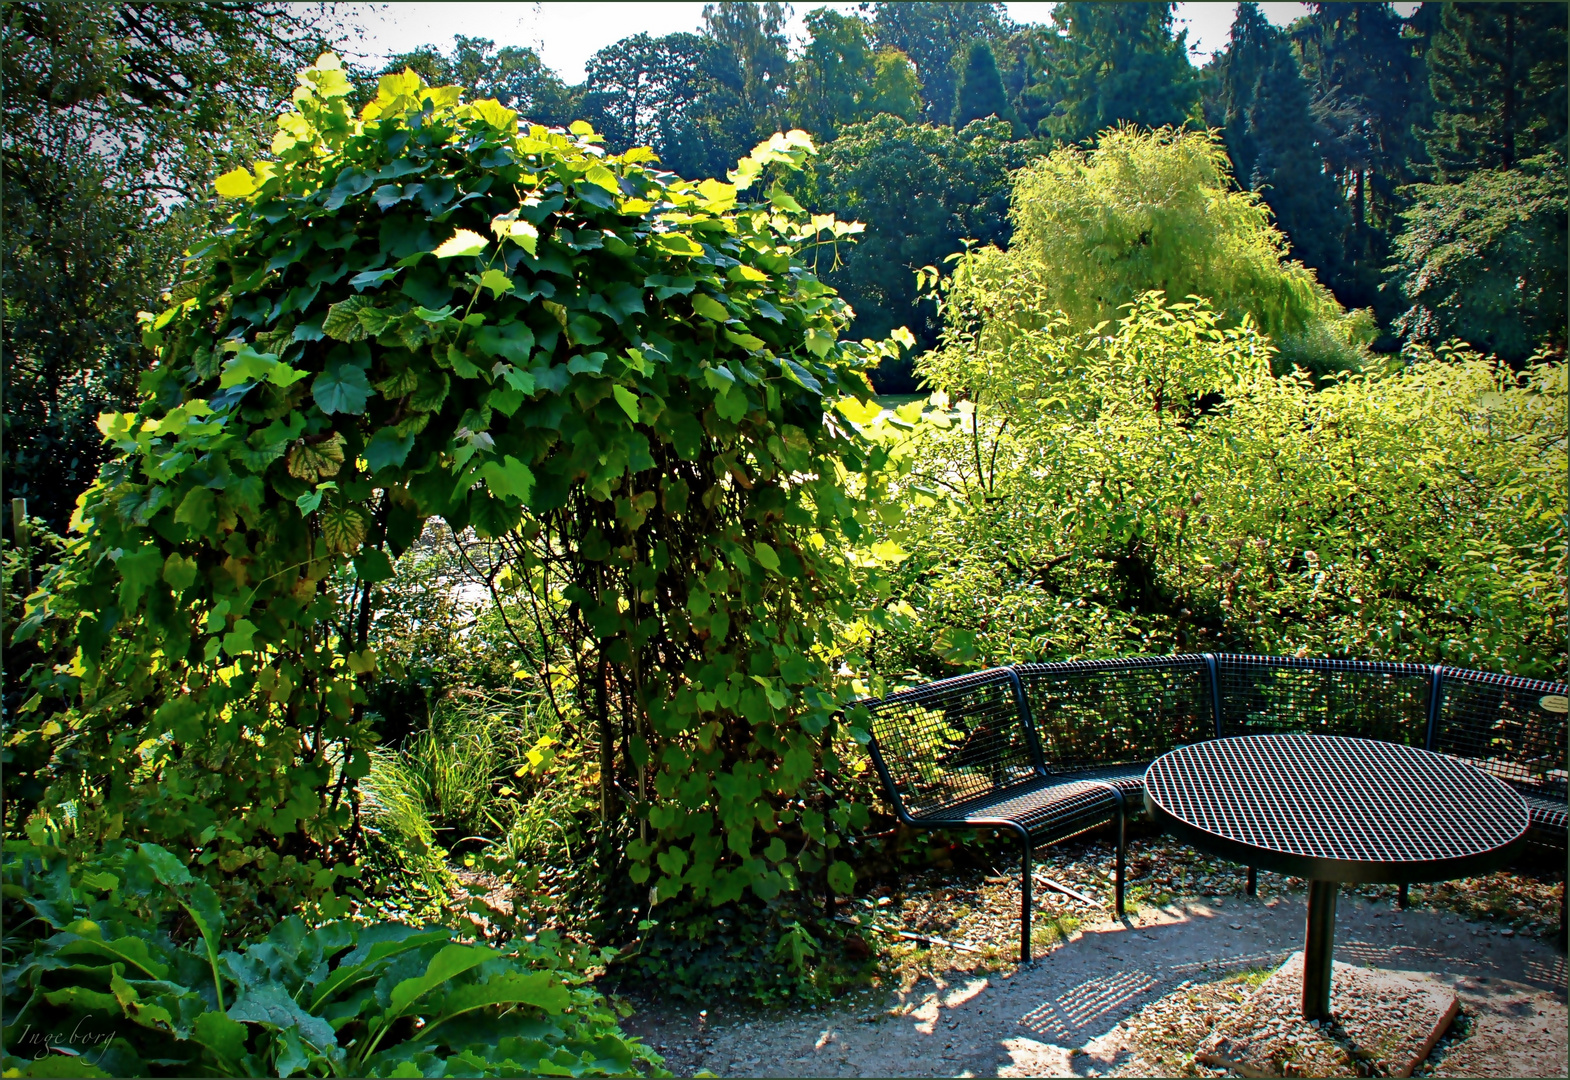 Bank Leere Foto Bild Natur Münster Botanischer Garten Bilder